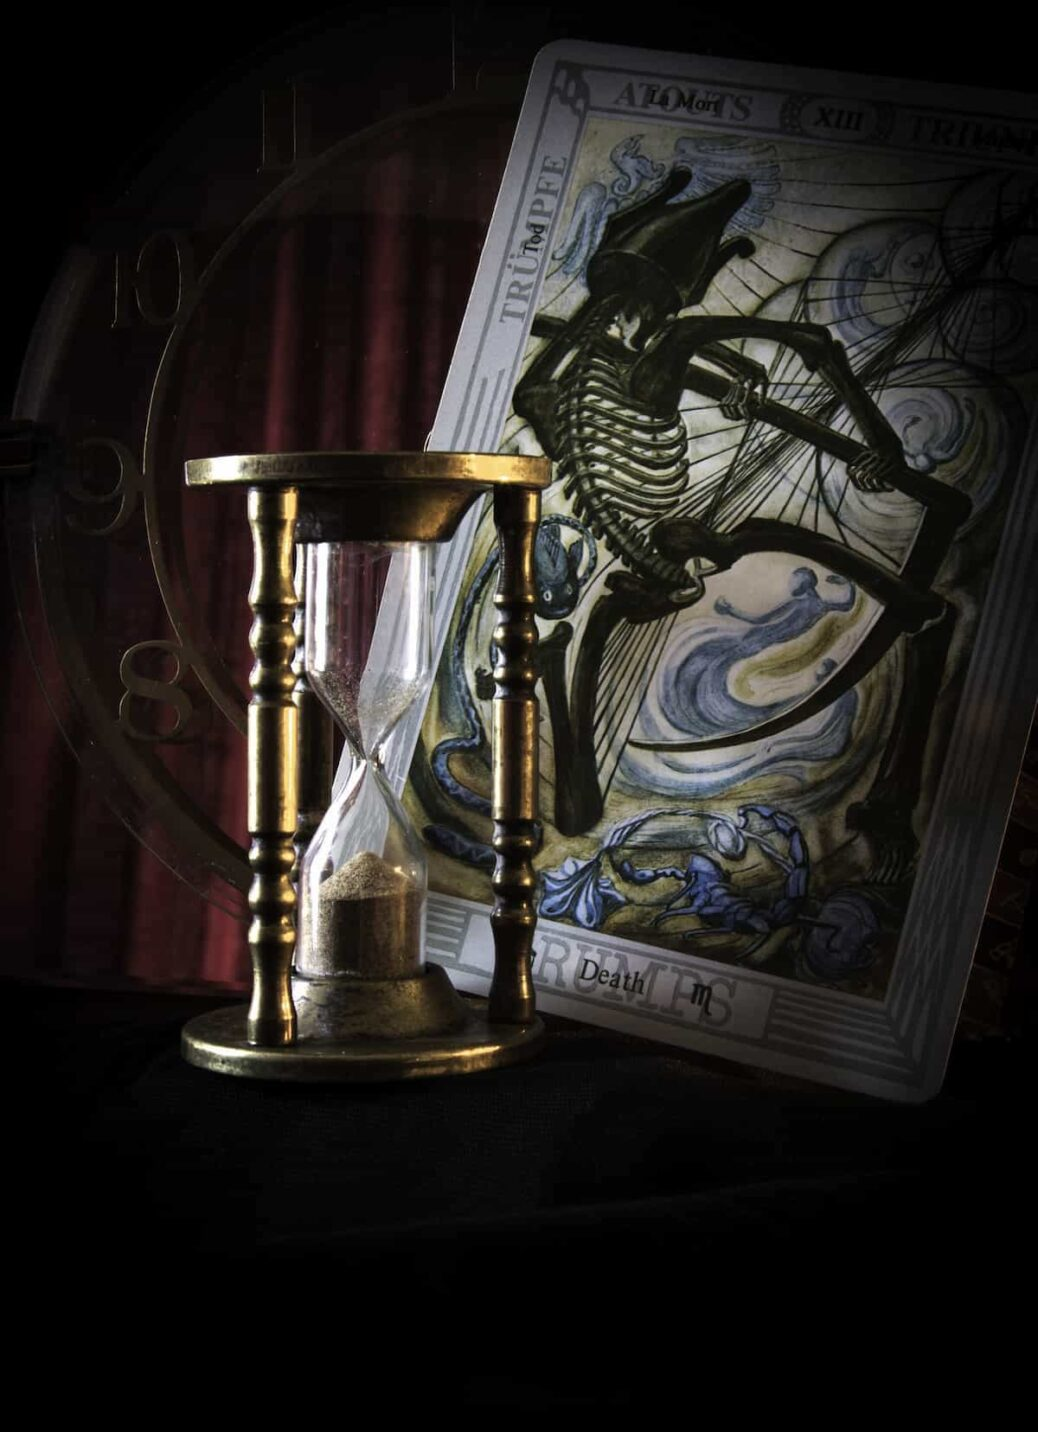 carta de la muerte, la muerte en el tarot, significado de la muerte, carta número 13 del tarot